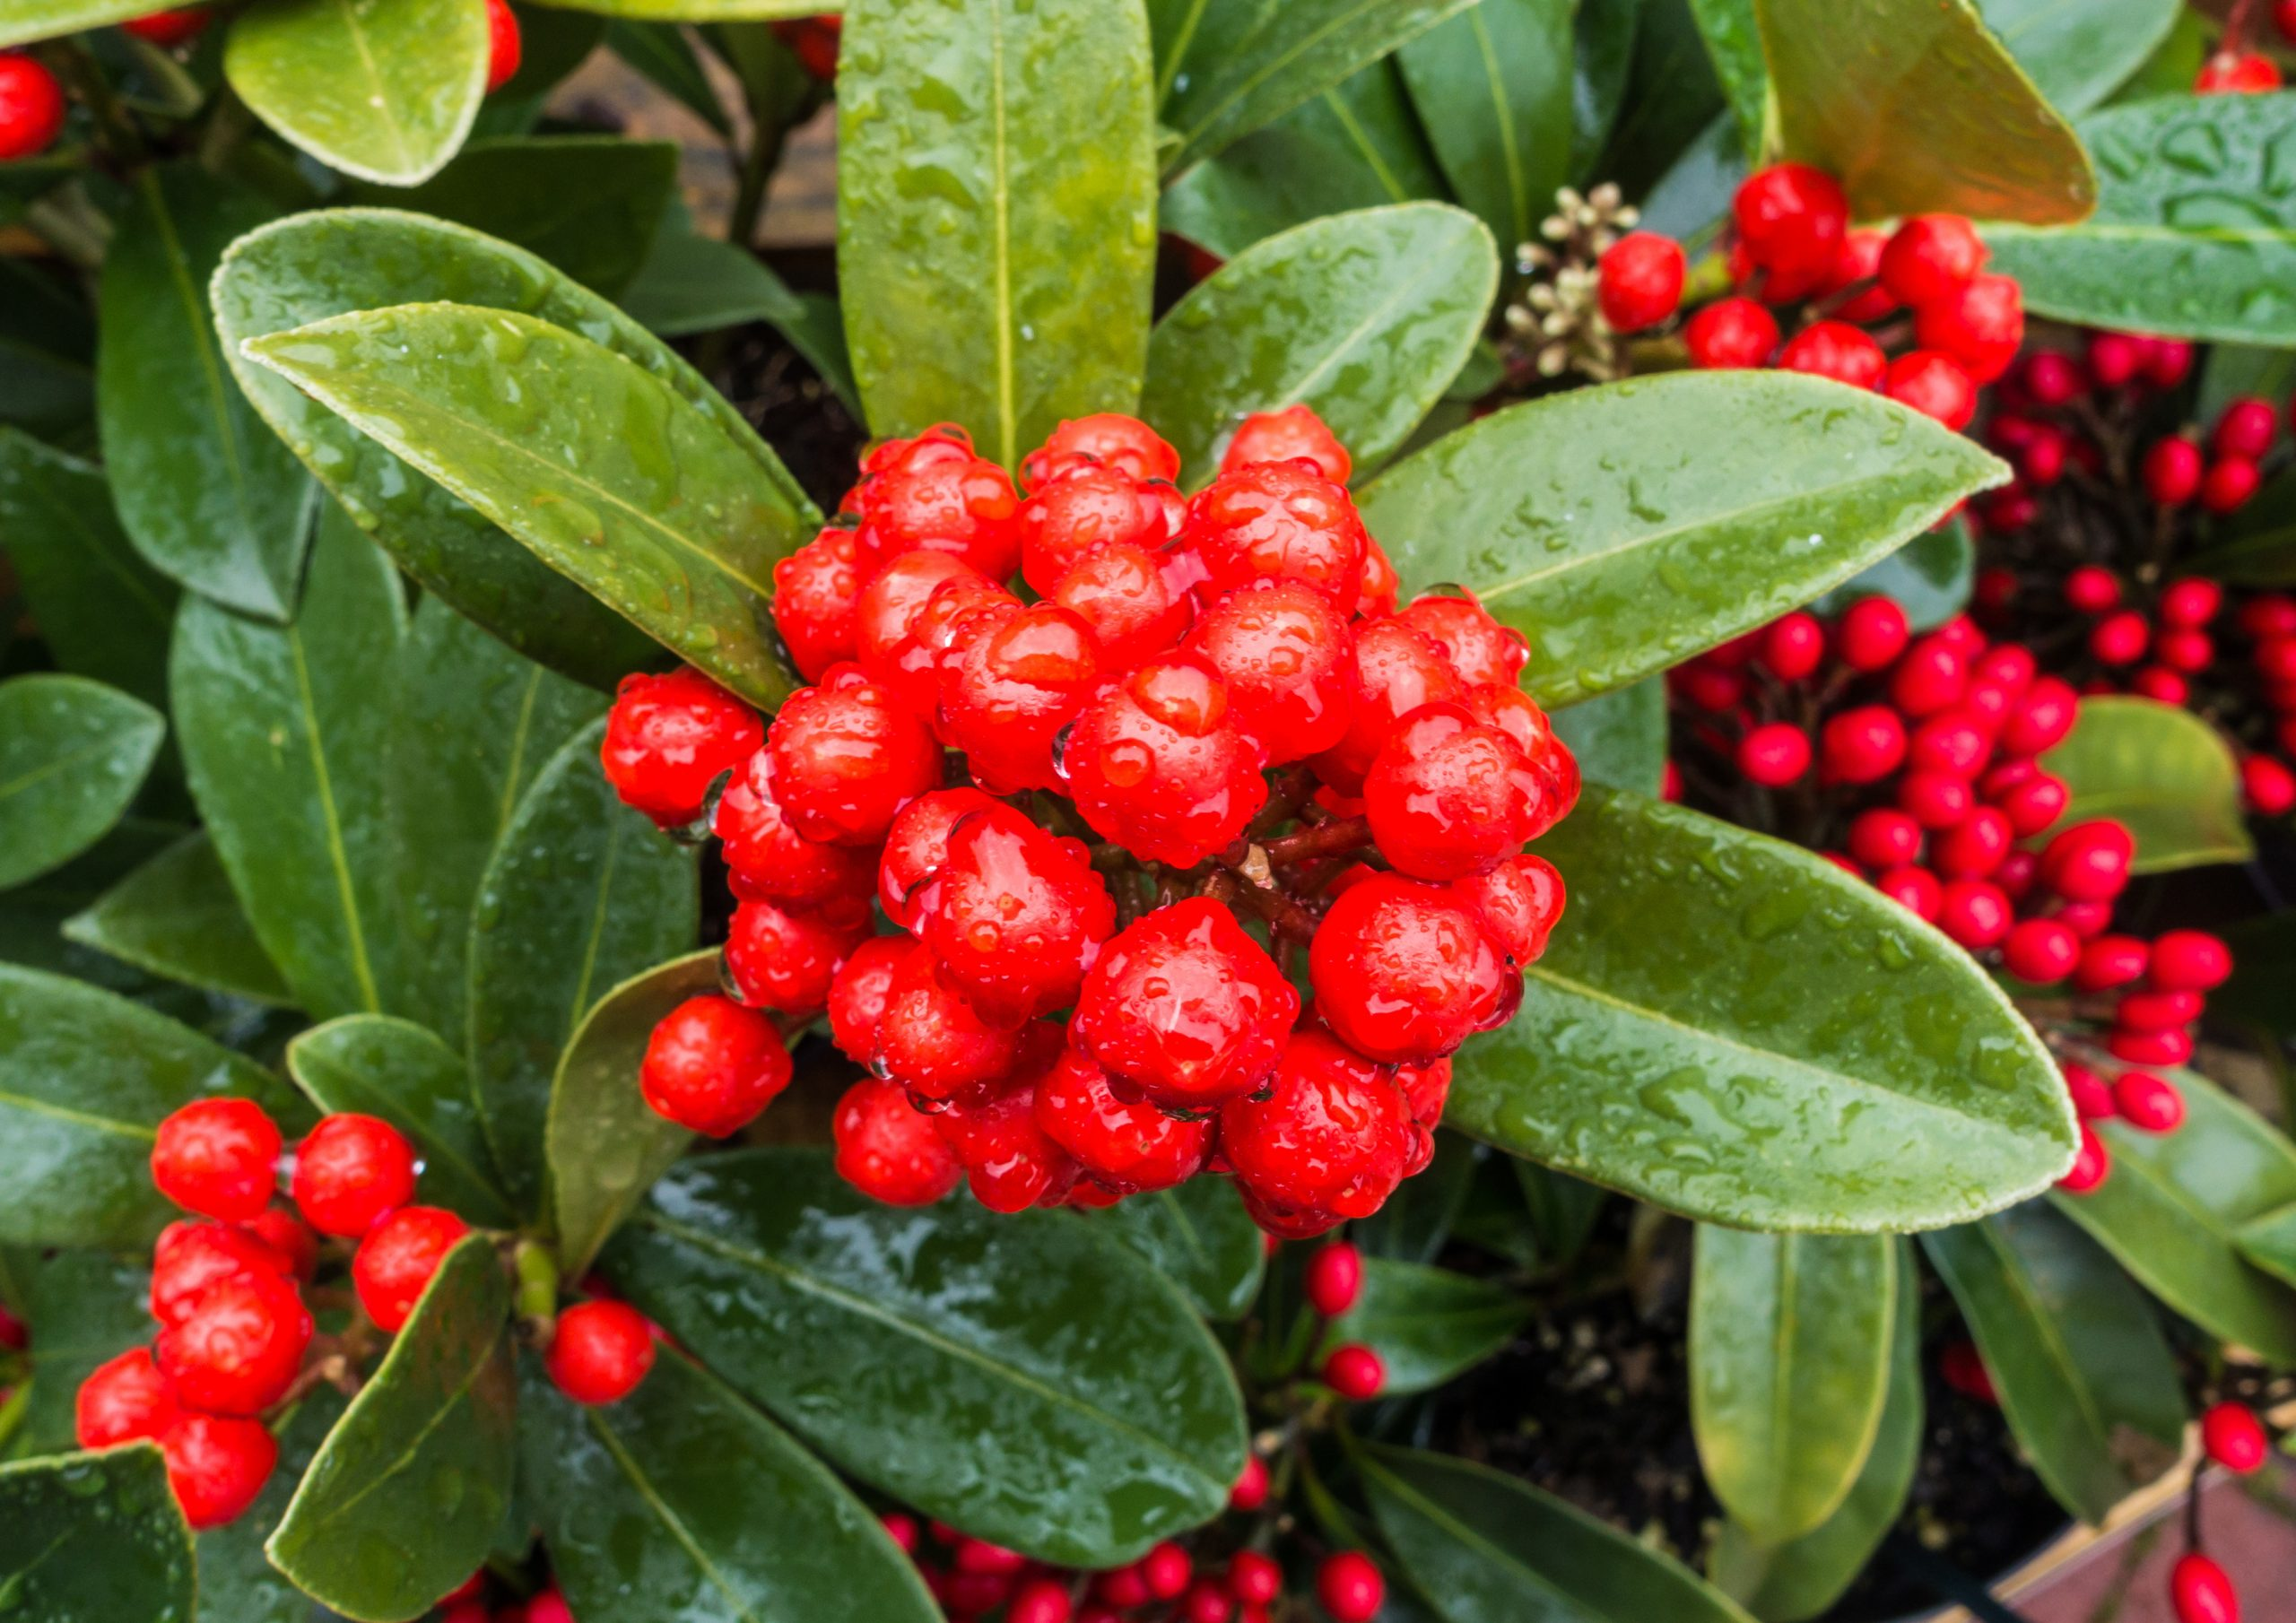 A macro shot of some wet skimmia bush berries.